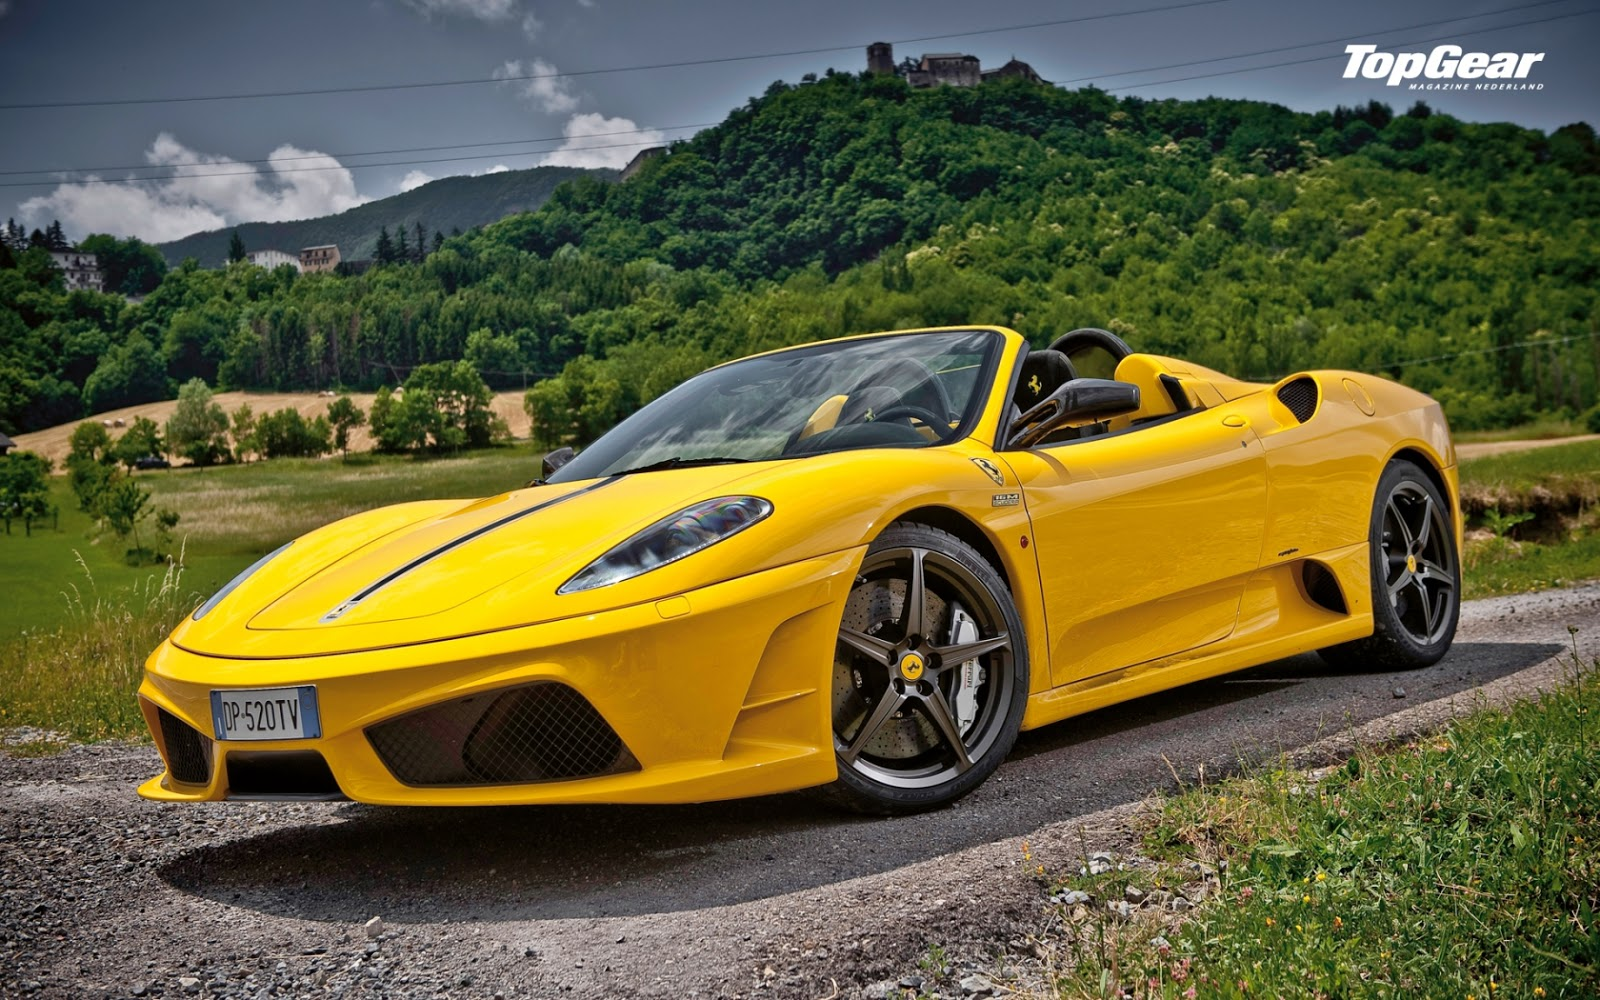 Yellow Ferrari F430 Scuderia Spider Wallpapers Hd High Definitions